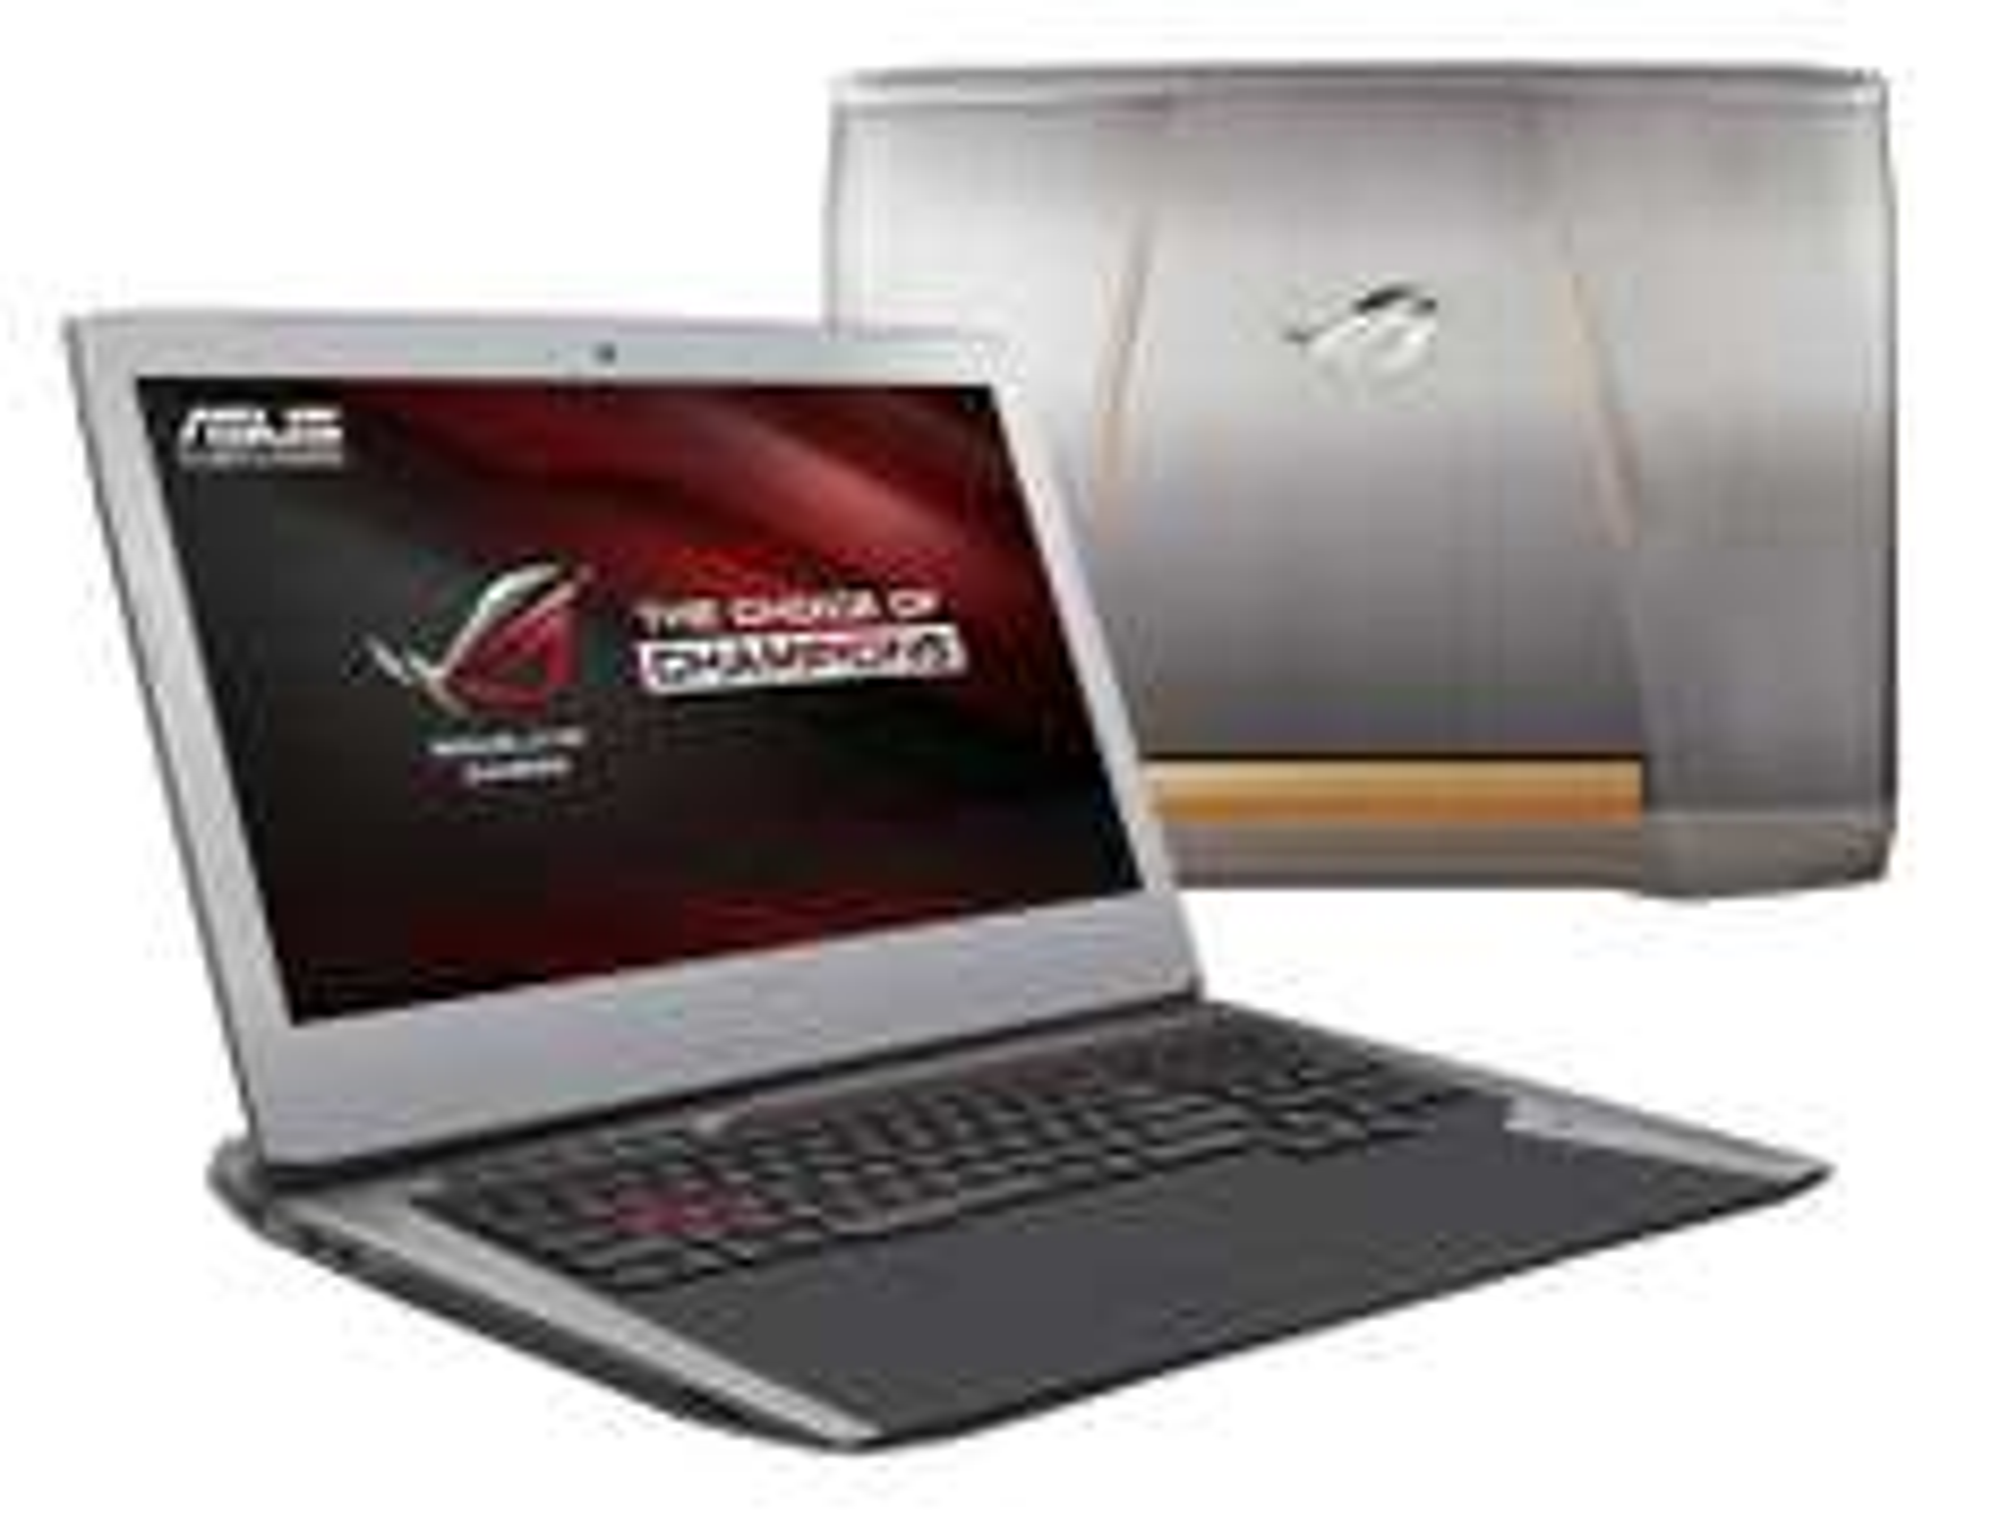 "PC portable gamer 17,3"" Asus ROG G752VT-GC073T (i7-6700HQ Skylake, HDD 1 To + SSD 128 Go, RAM 16 Go, GTX 970M) - Reconditionné"